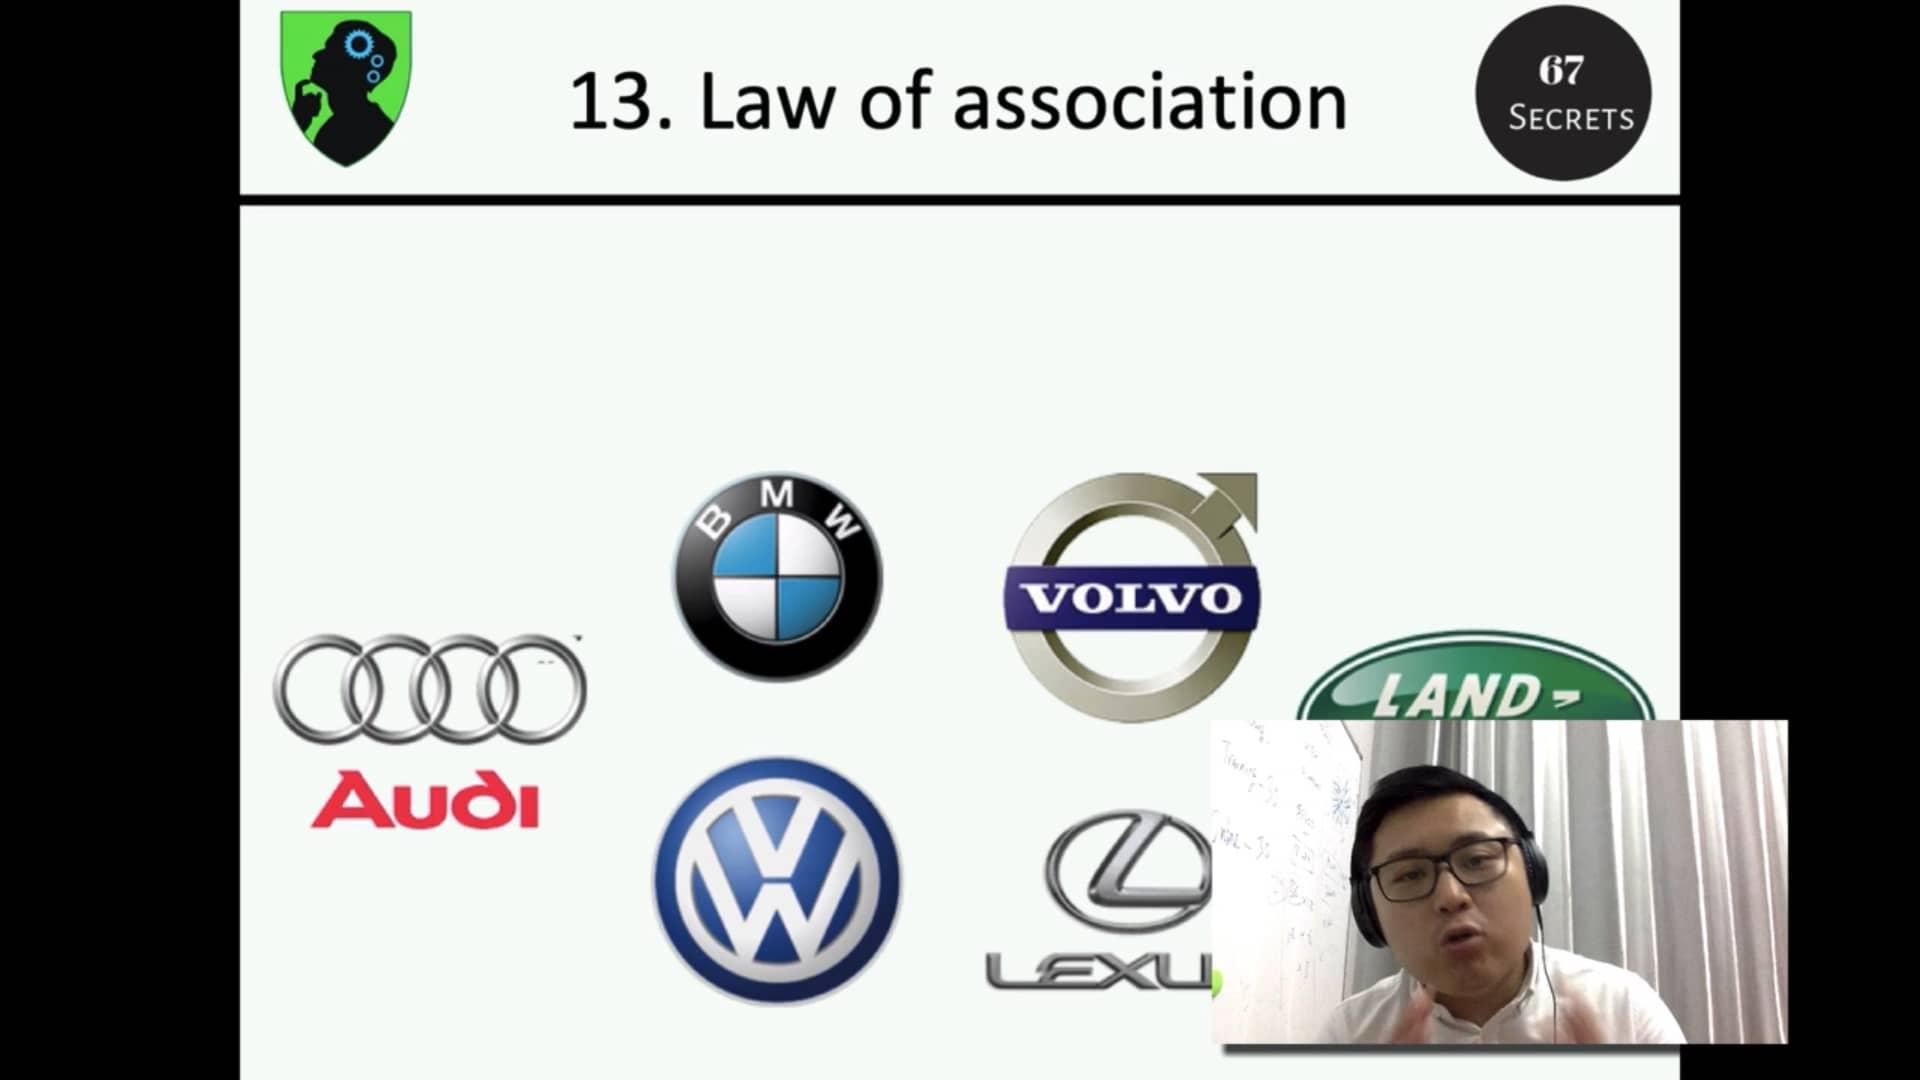 13. Law of association